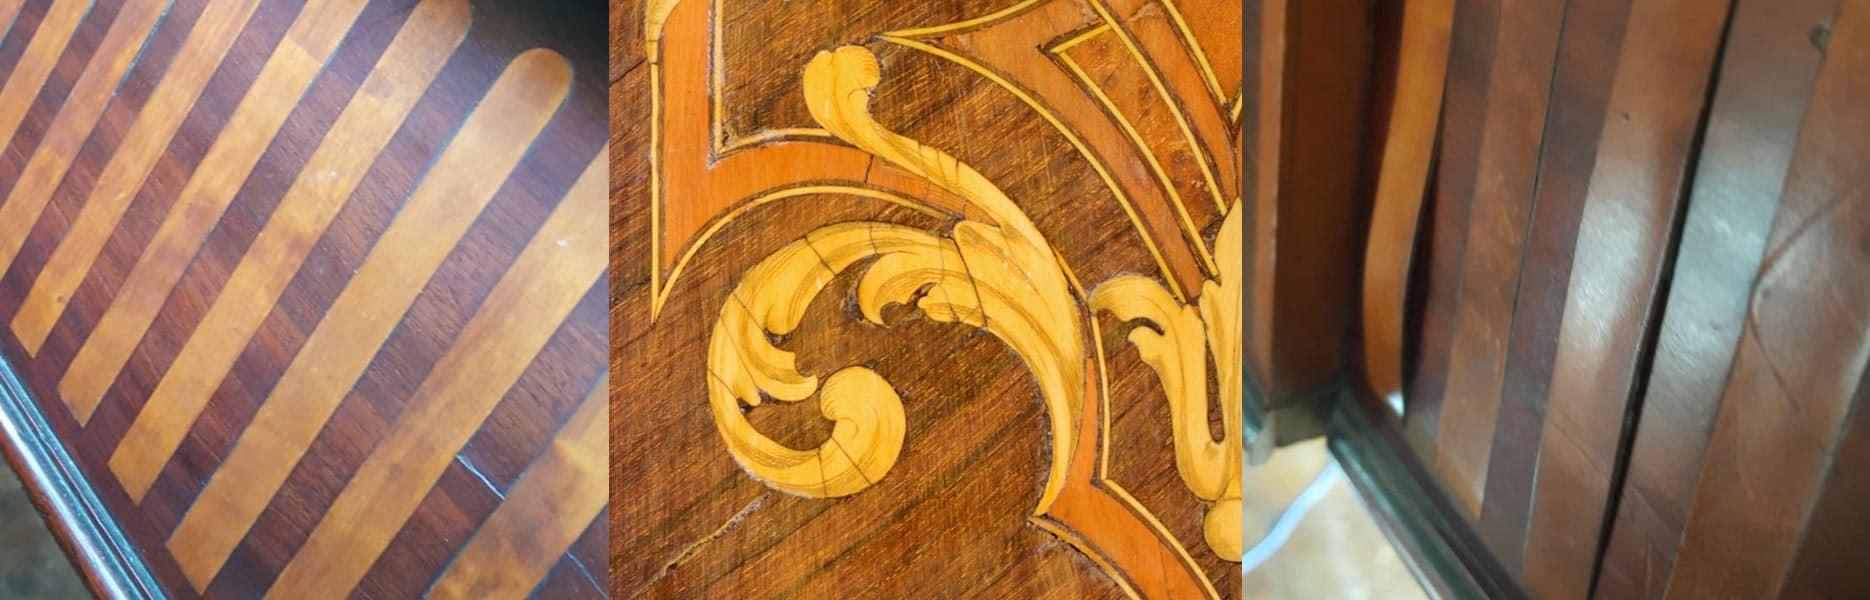 Veneer Repairs, Marquetry and Inlay Restoration